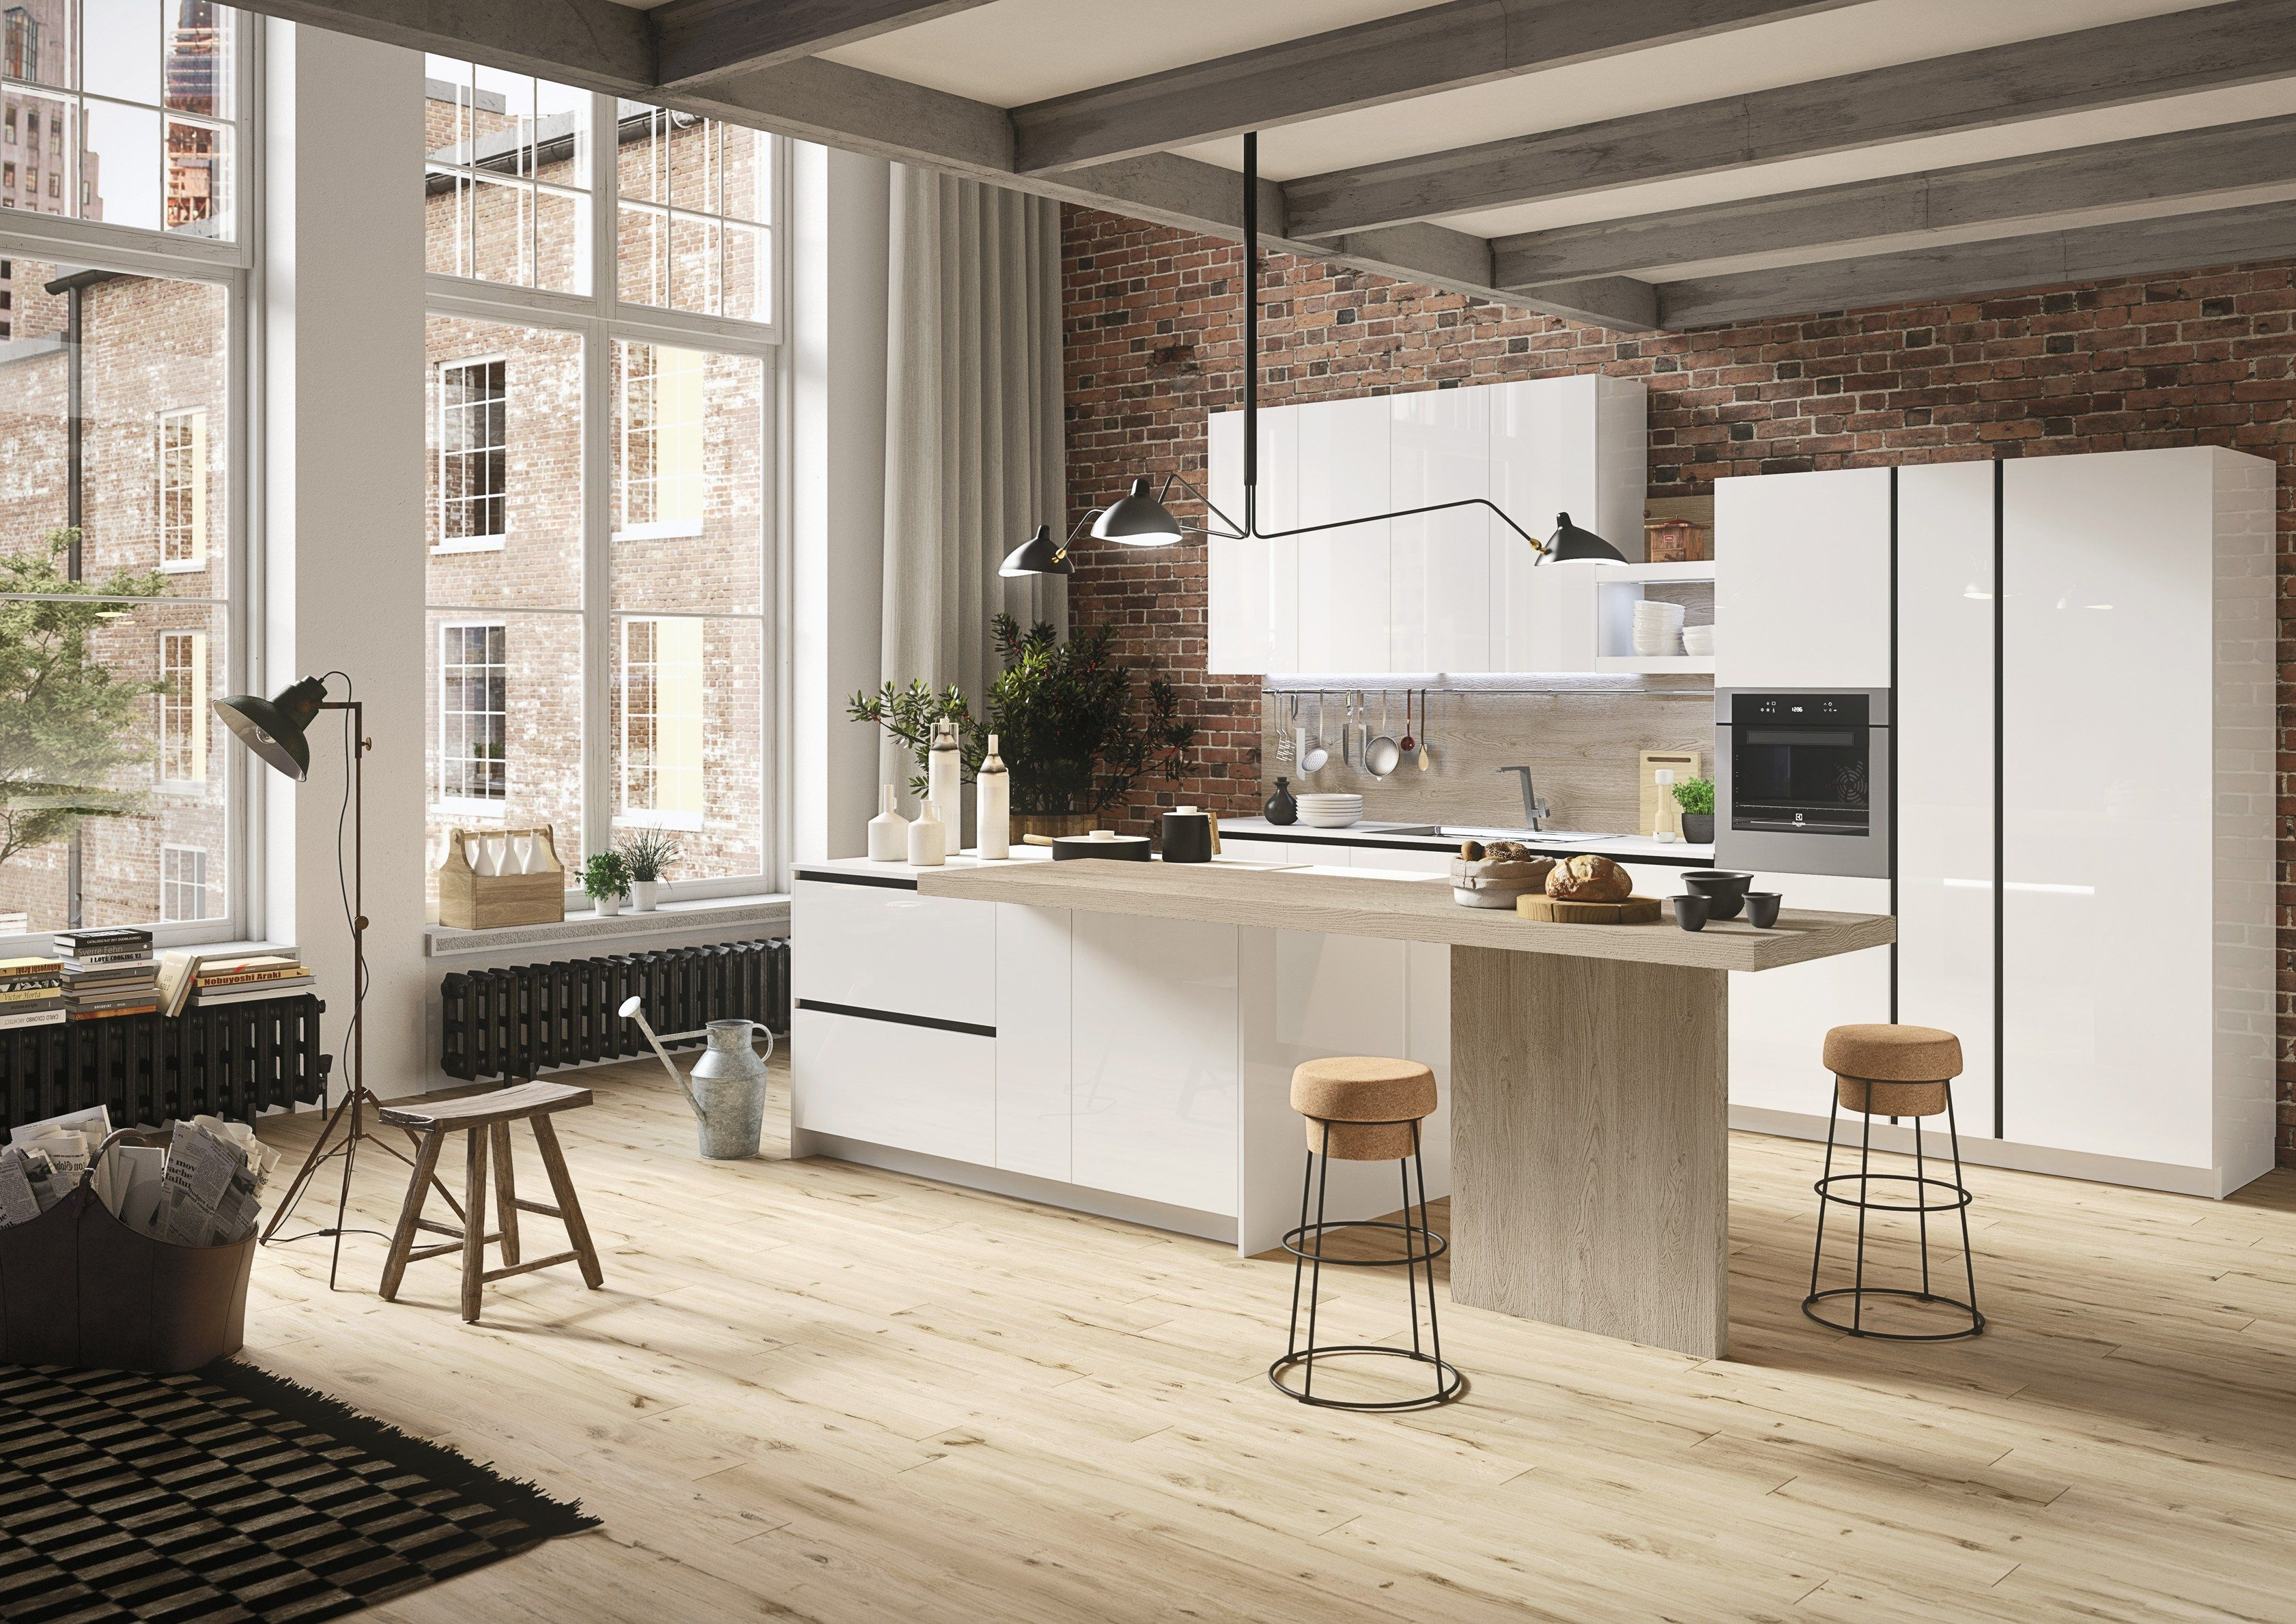 Ideen für die küche in farbe doors in high gloss lacquer with edging chalk white worktop in